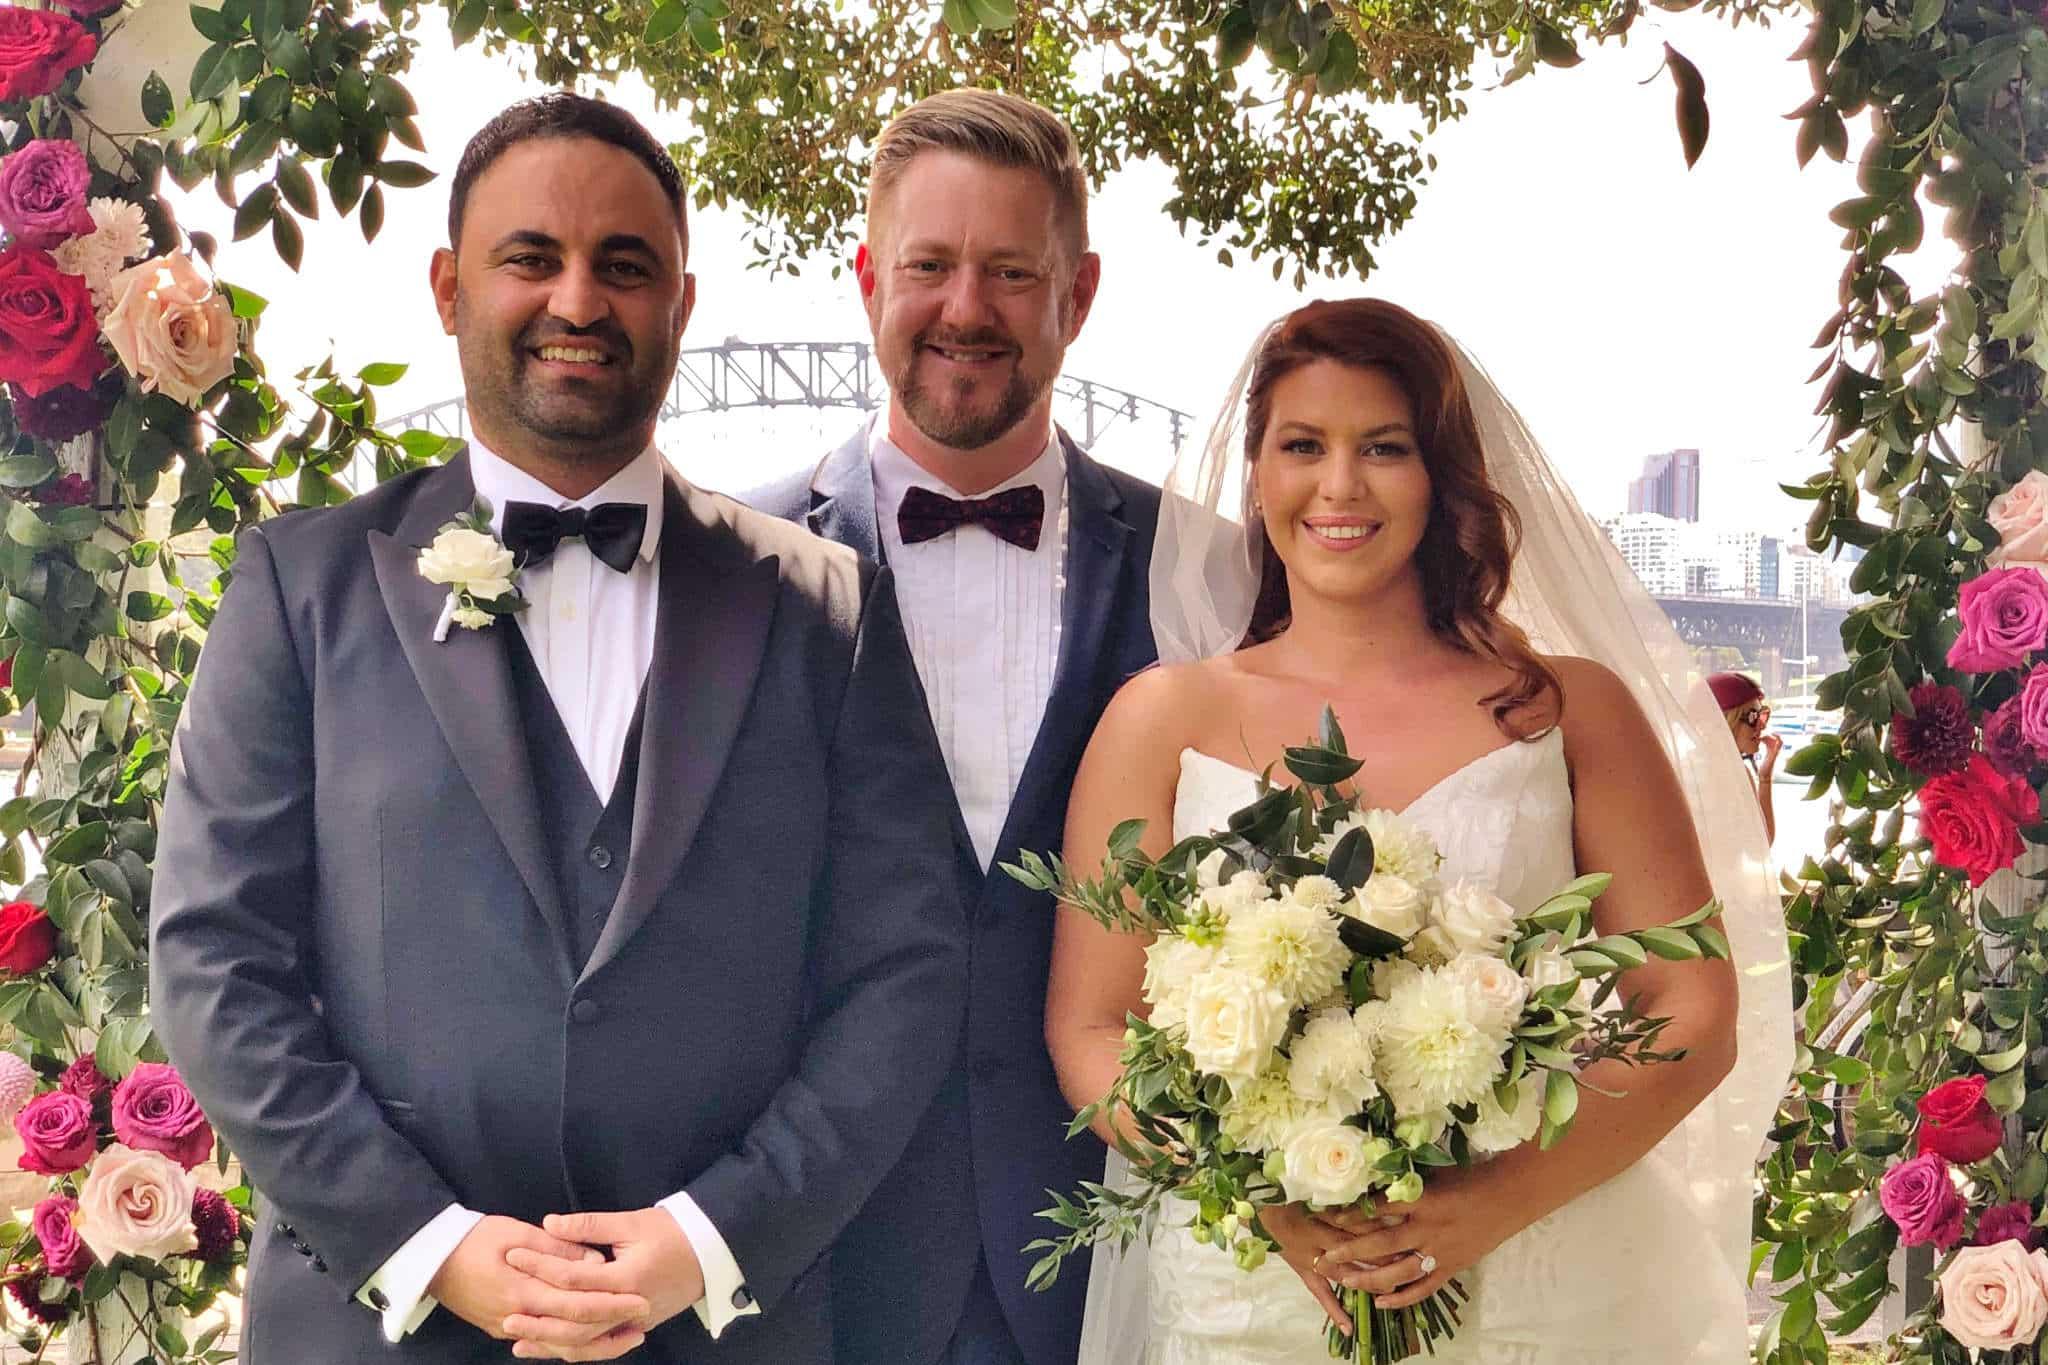 Royal Botanic Garden Wedding - Sydney Marriage Celebrant Stephen Lee